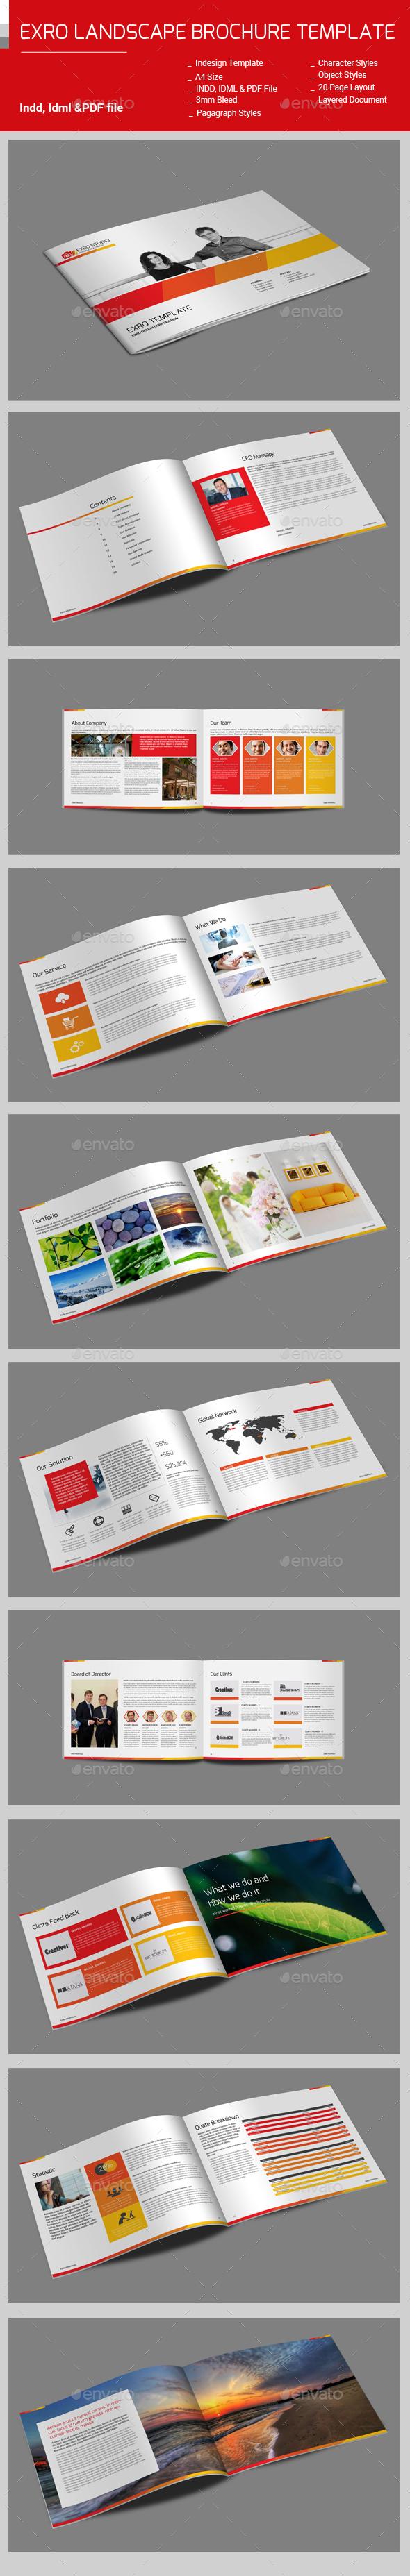 Exro Landscape BrochureTemplate - Corporate Brochures